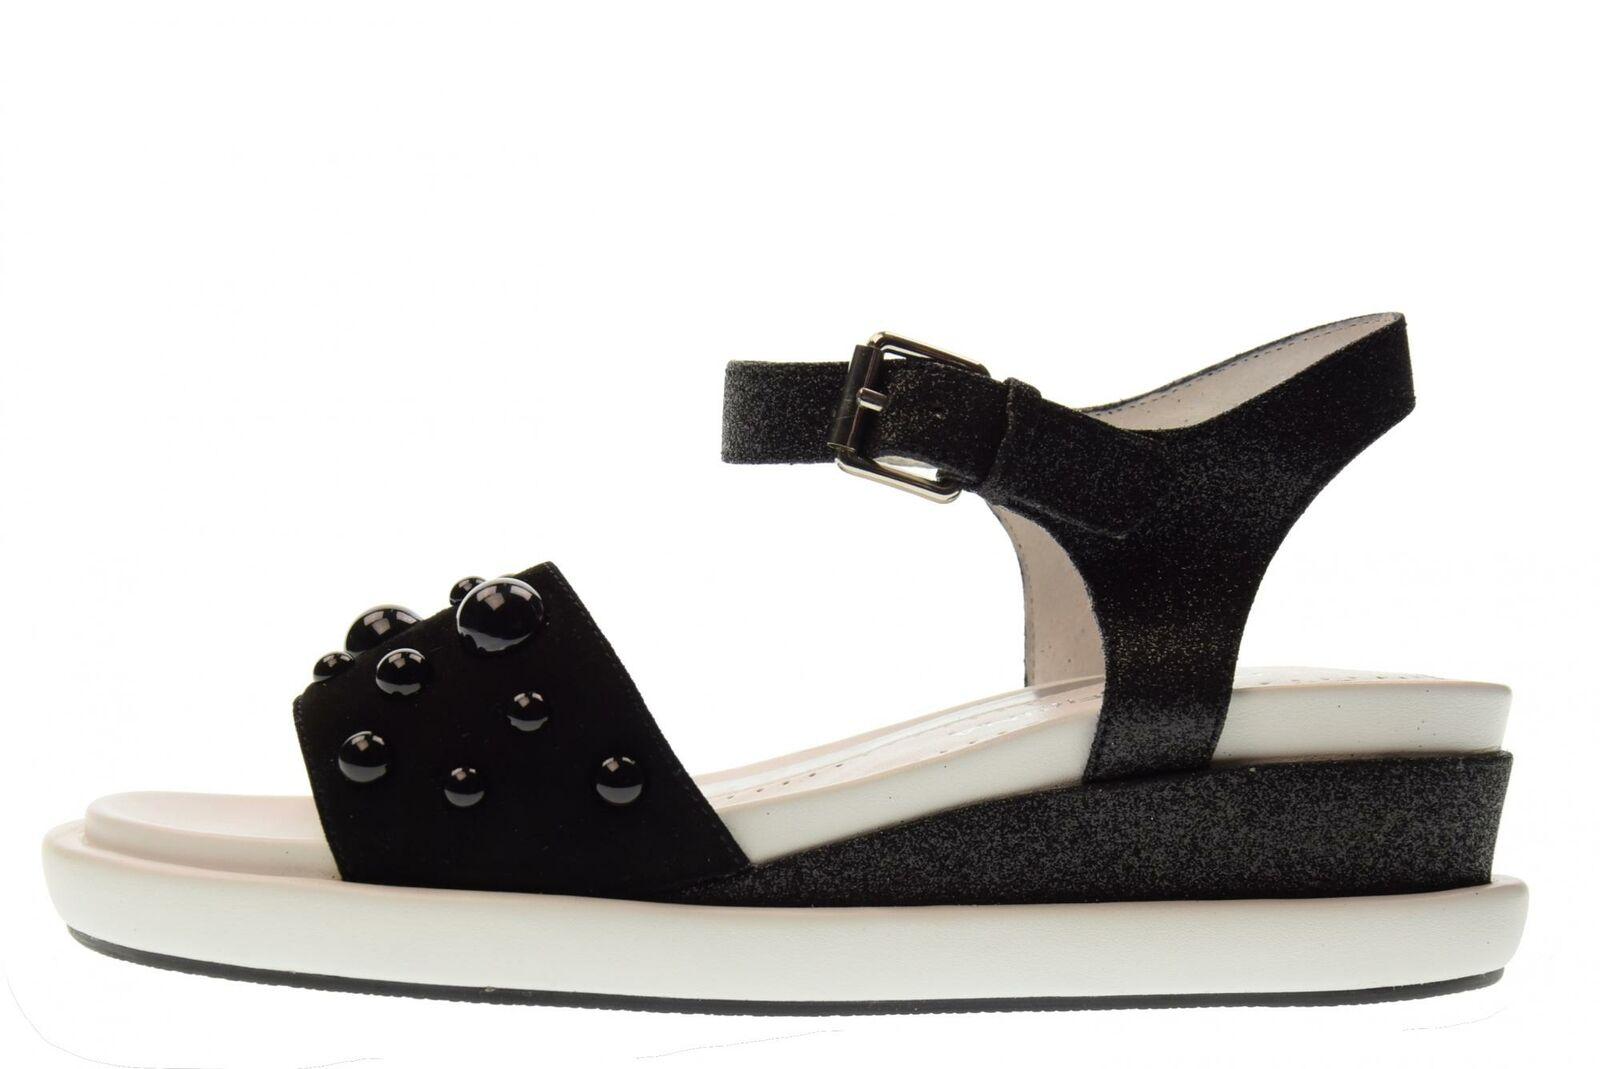 Altraofficina P18u women's shoes sandals Q1302X BLACK BLACK BLACK cd3fbc